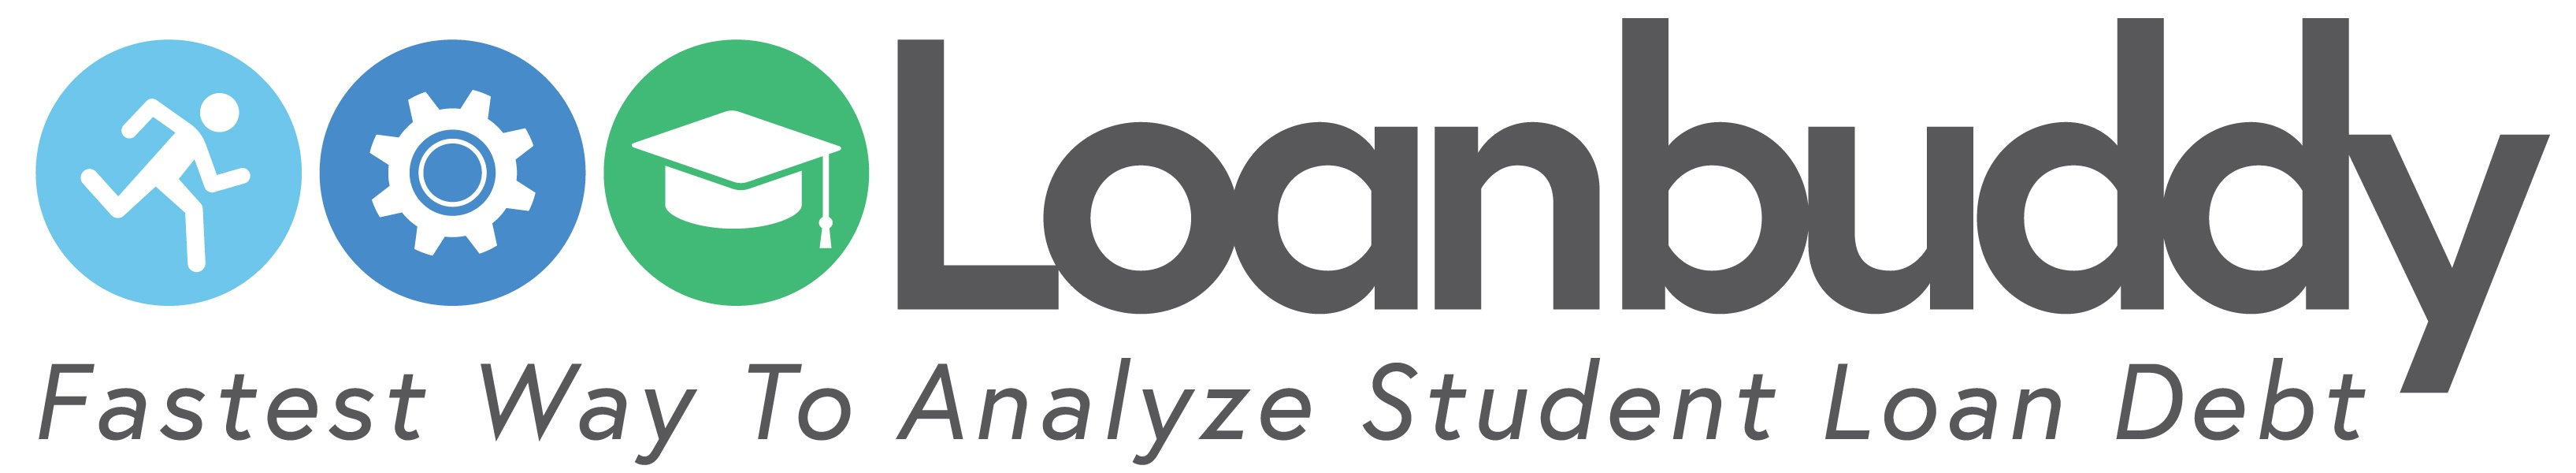 LoanBuddy_Logofile.jpg